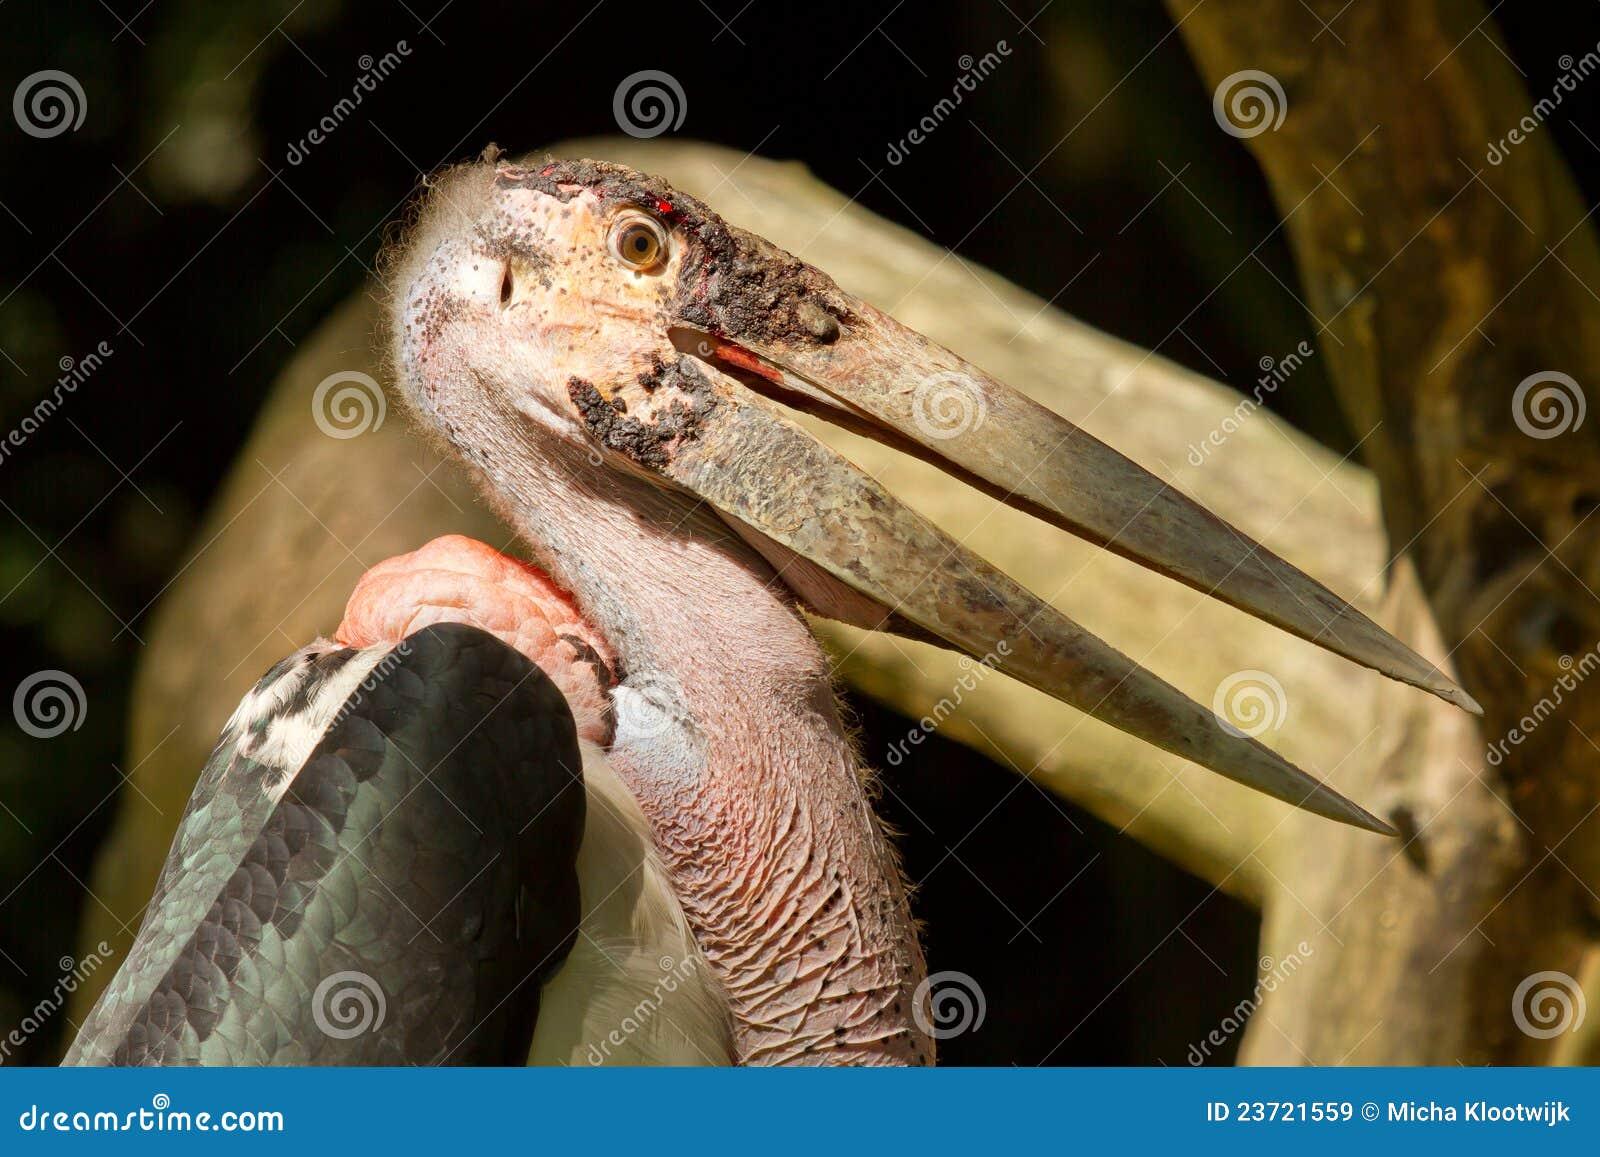 A close-up of an marabu